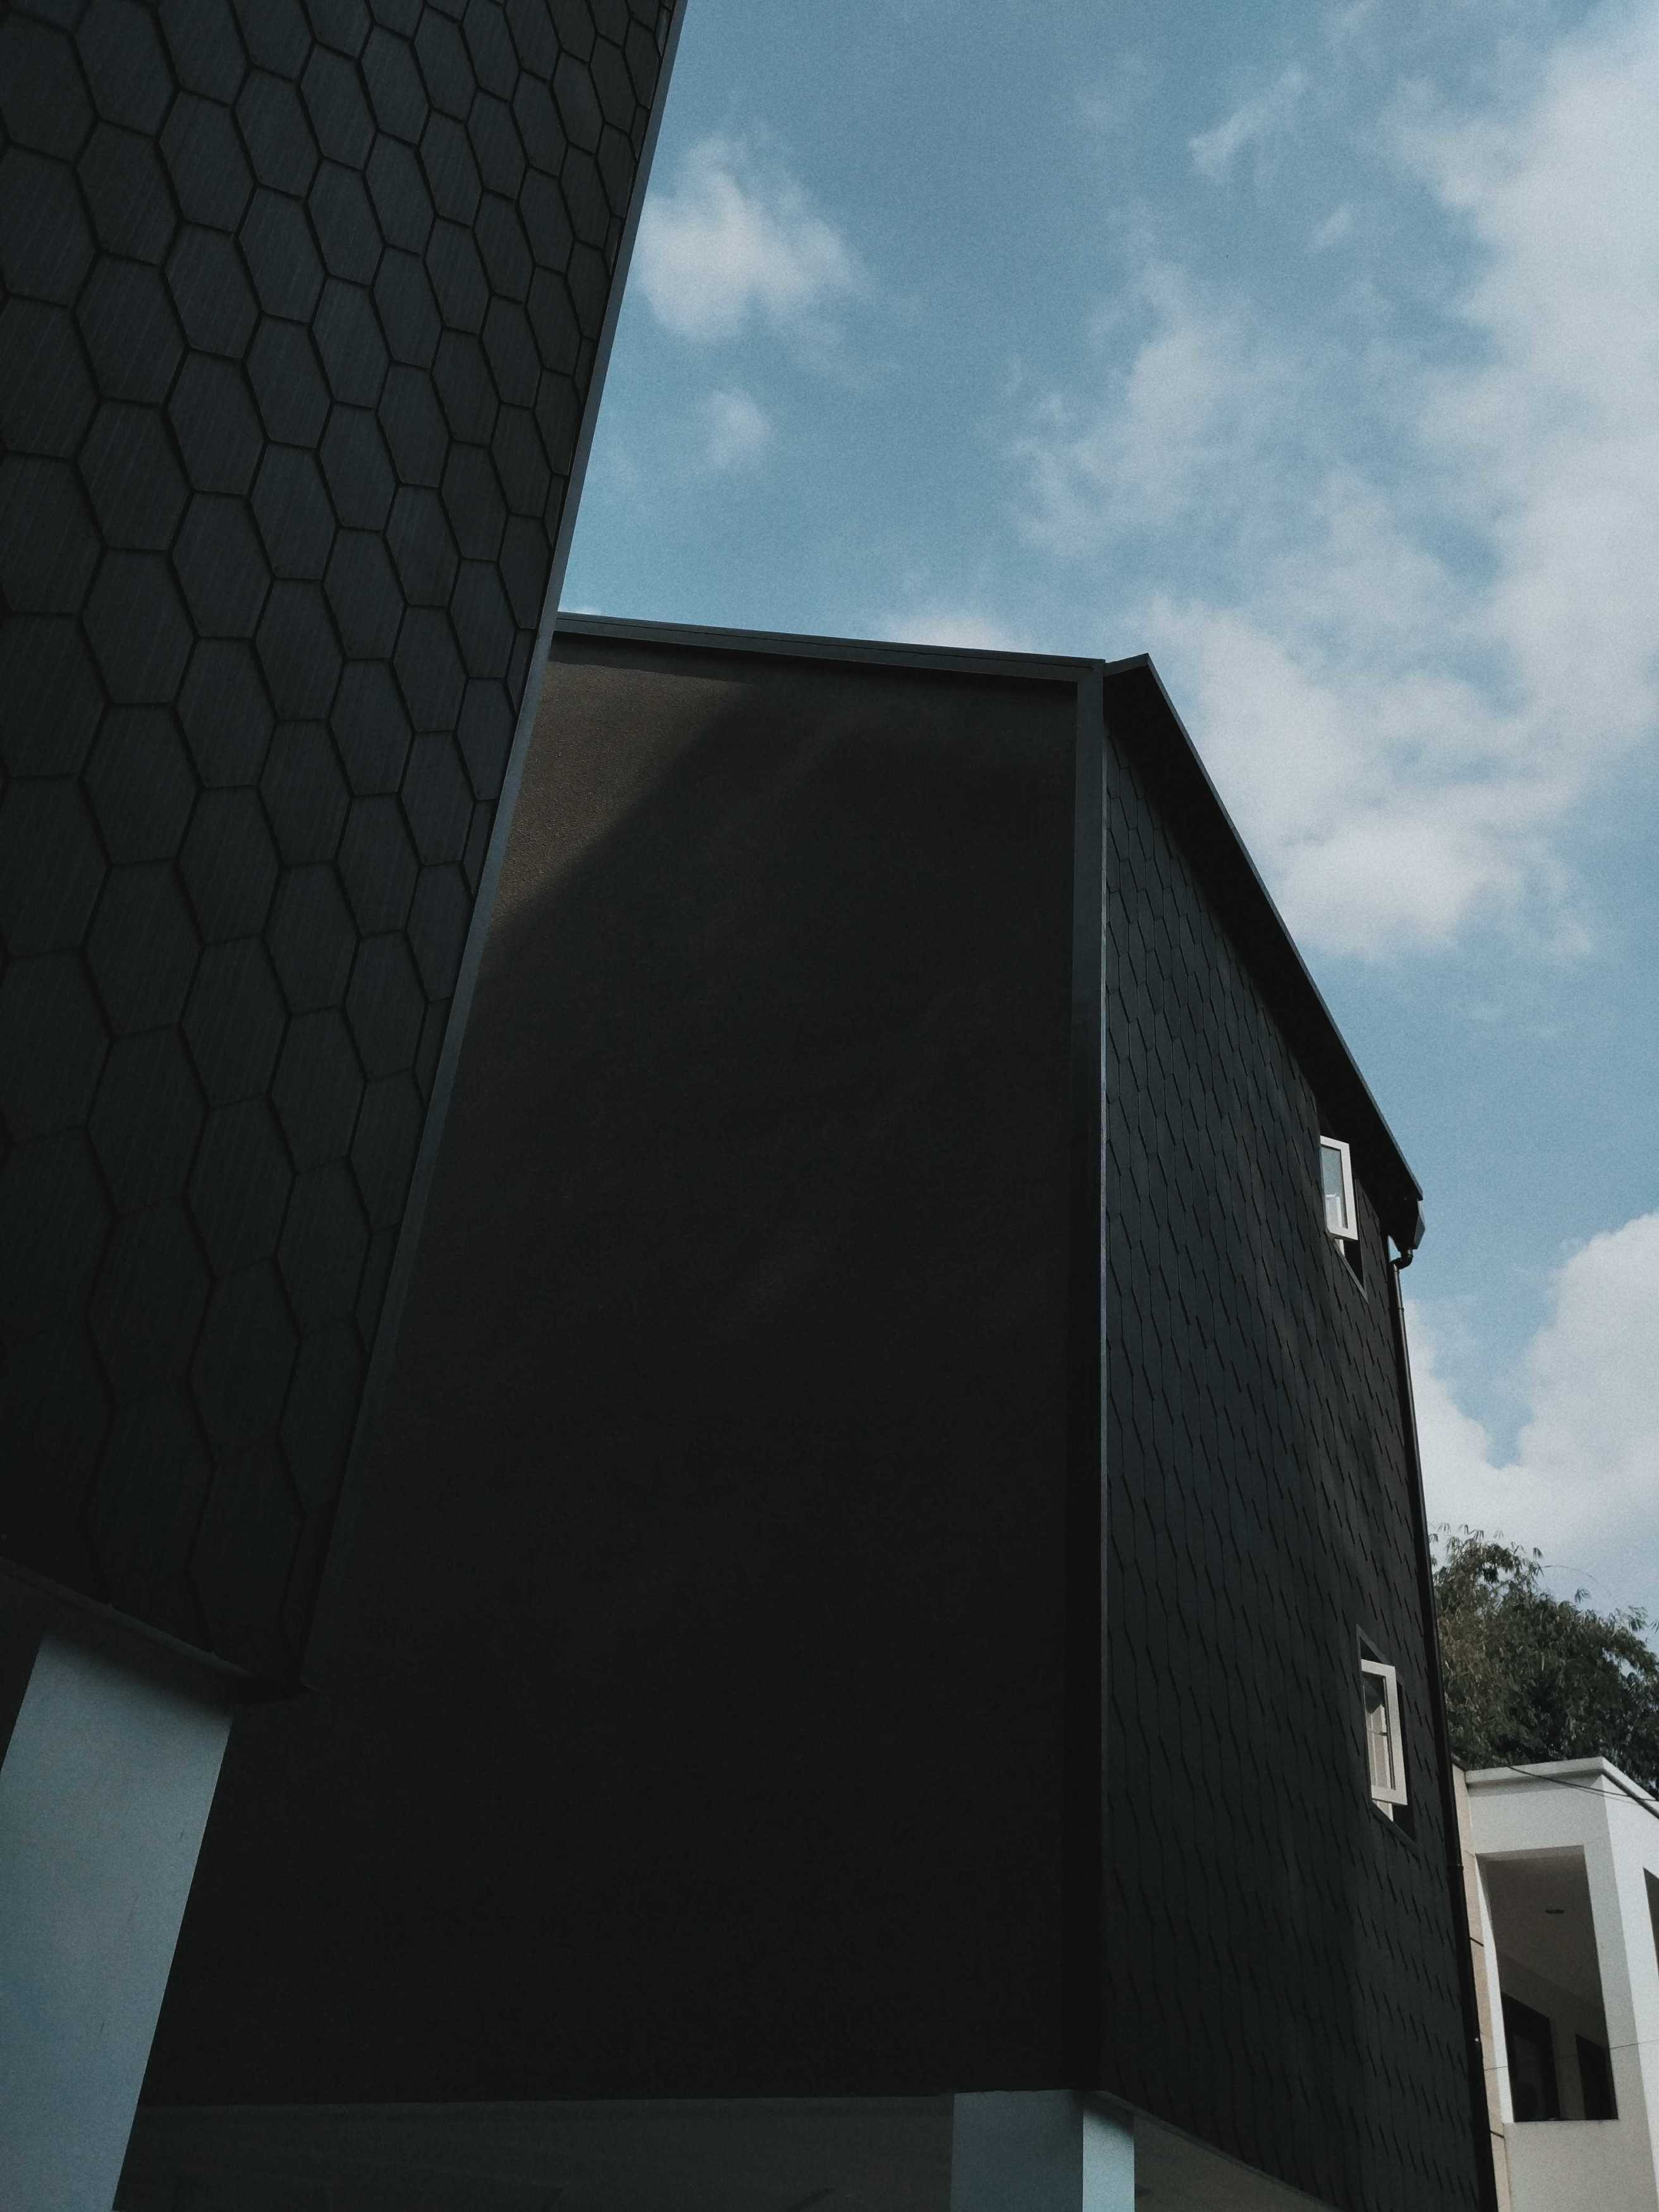 Dendy Darman Kenda House Bandung, Kota Bandung, Jawa Barat, Indonesia Bandung, Kota Bandung, Jawa Barat, Indonesia Kenda House - Exterior Scandinavian  44204